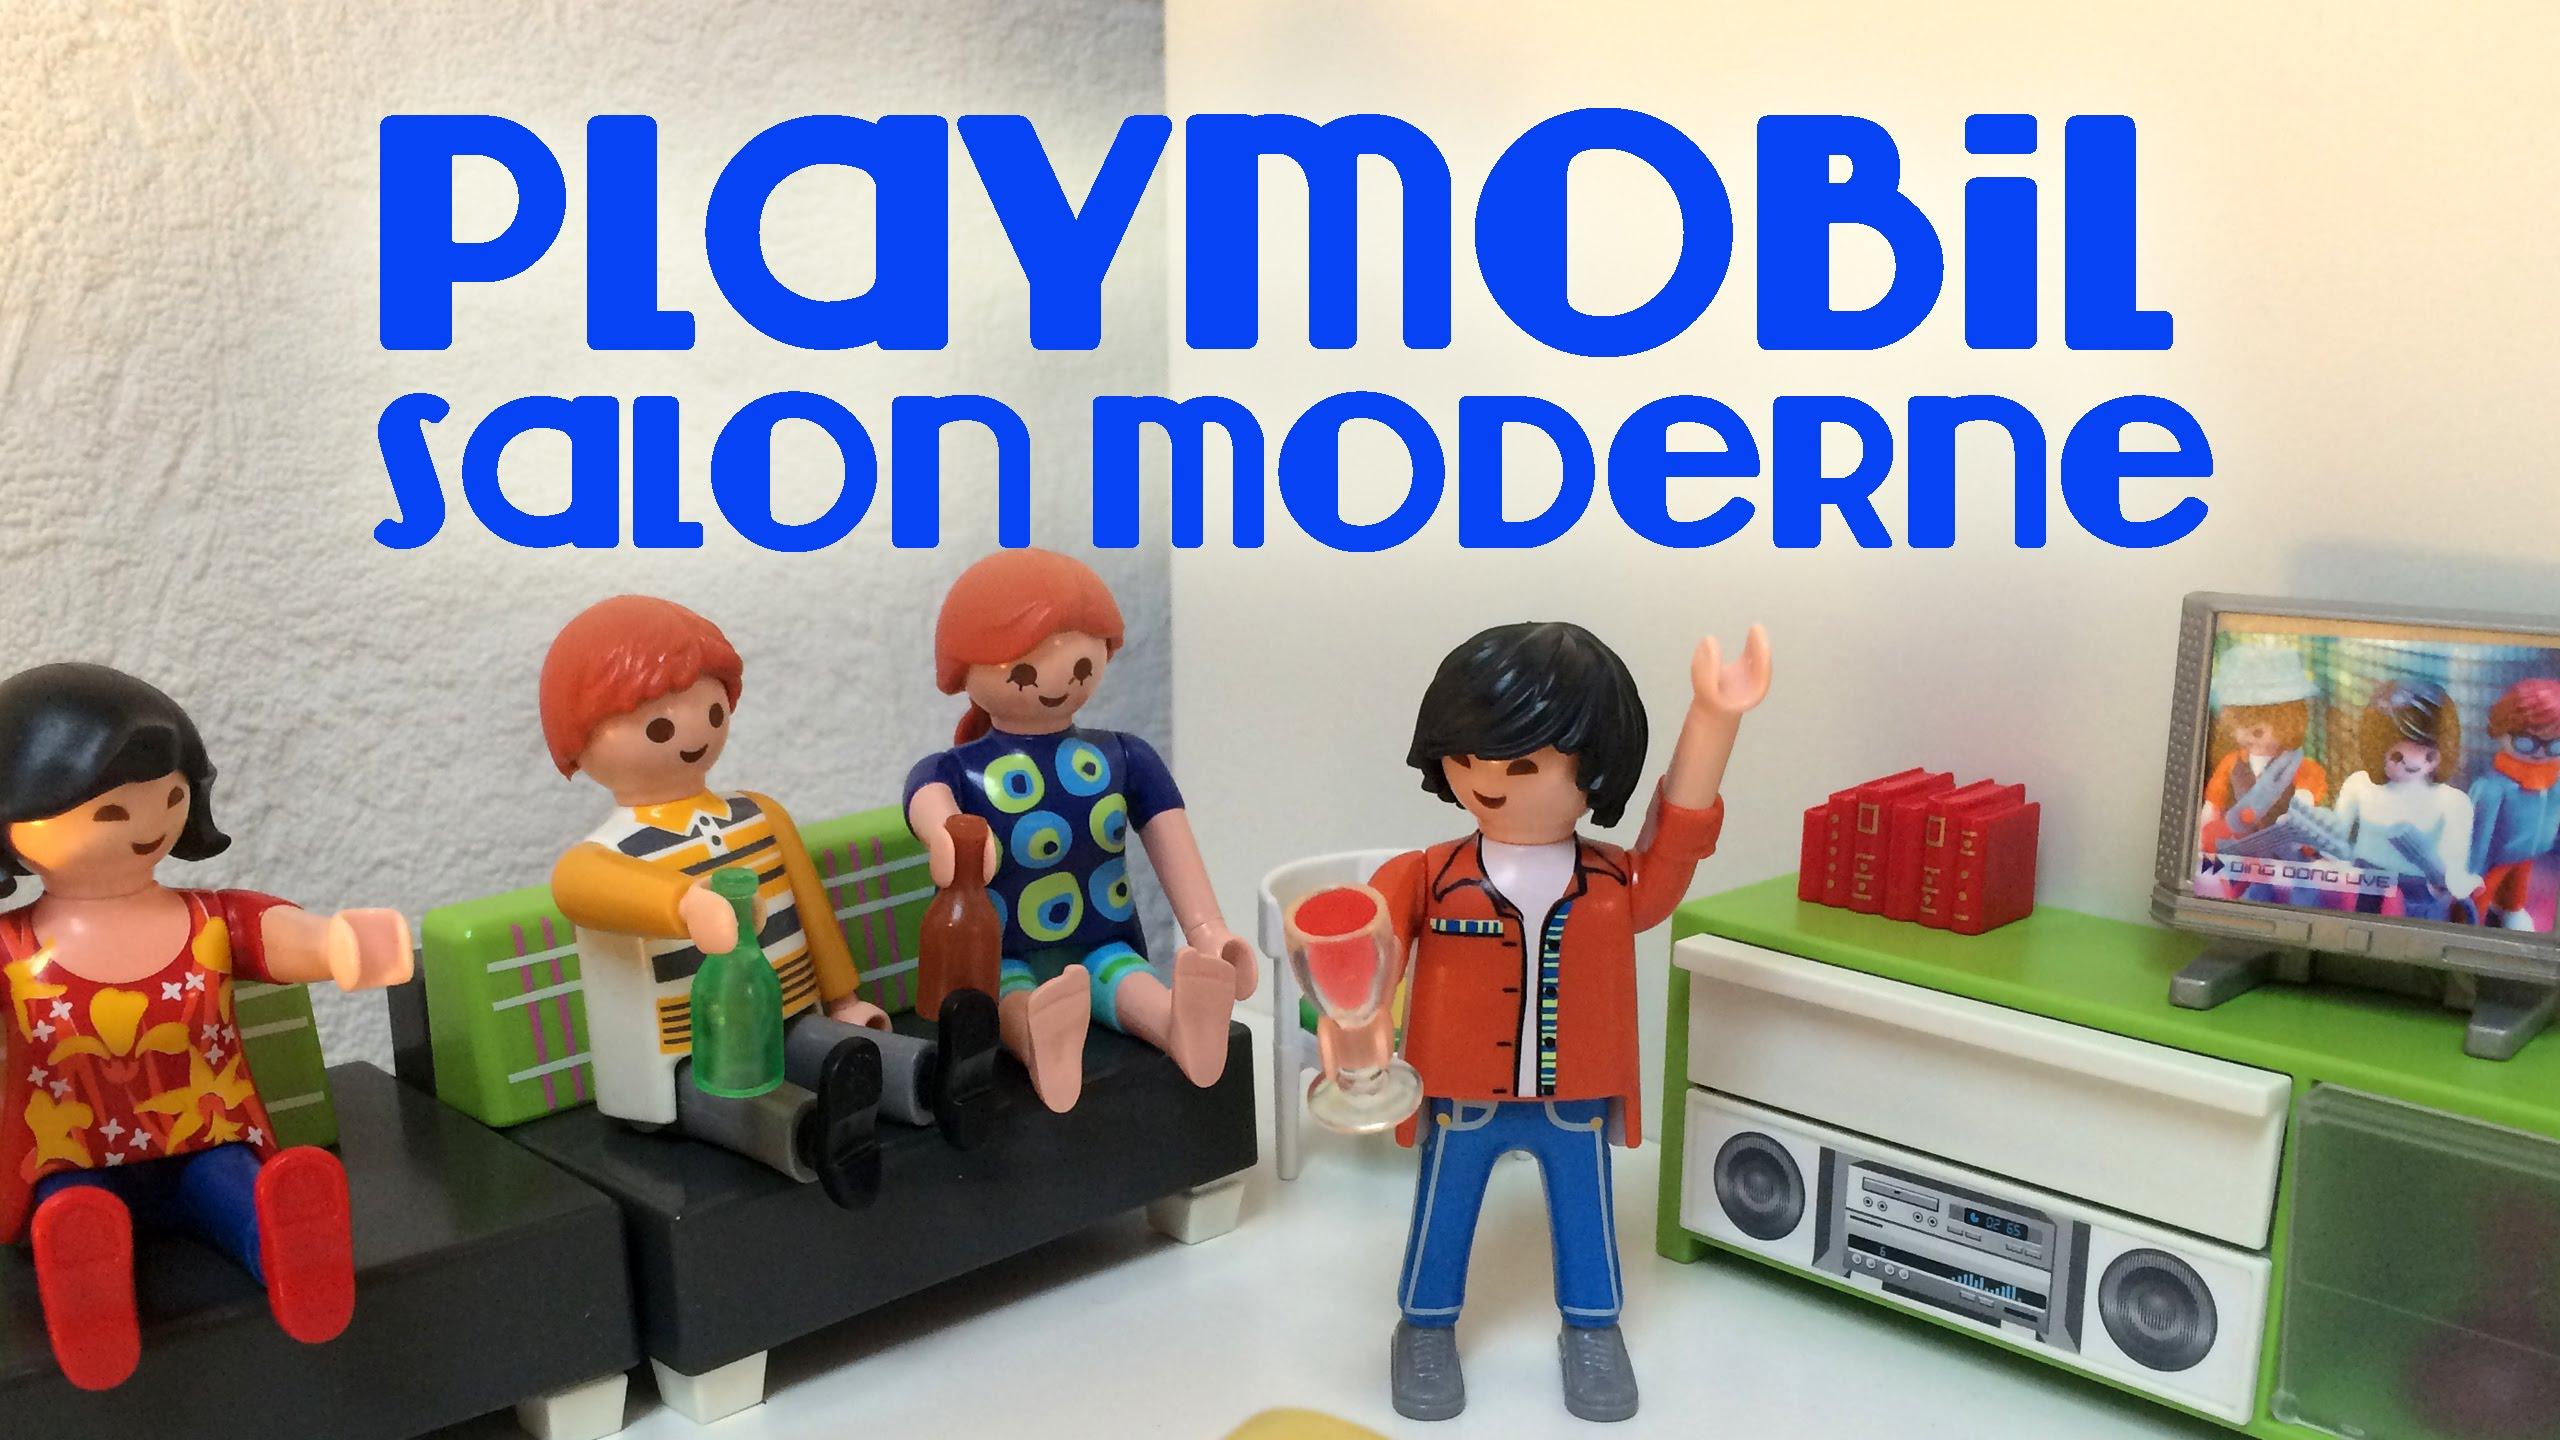 Playmobil maison moderne salon - zagafrica.fr